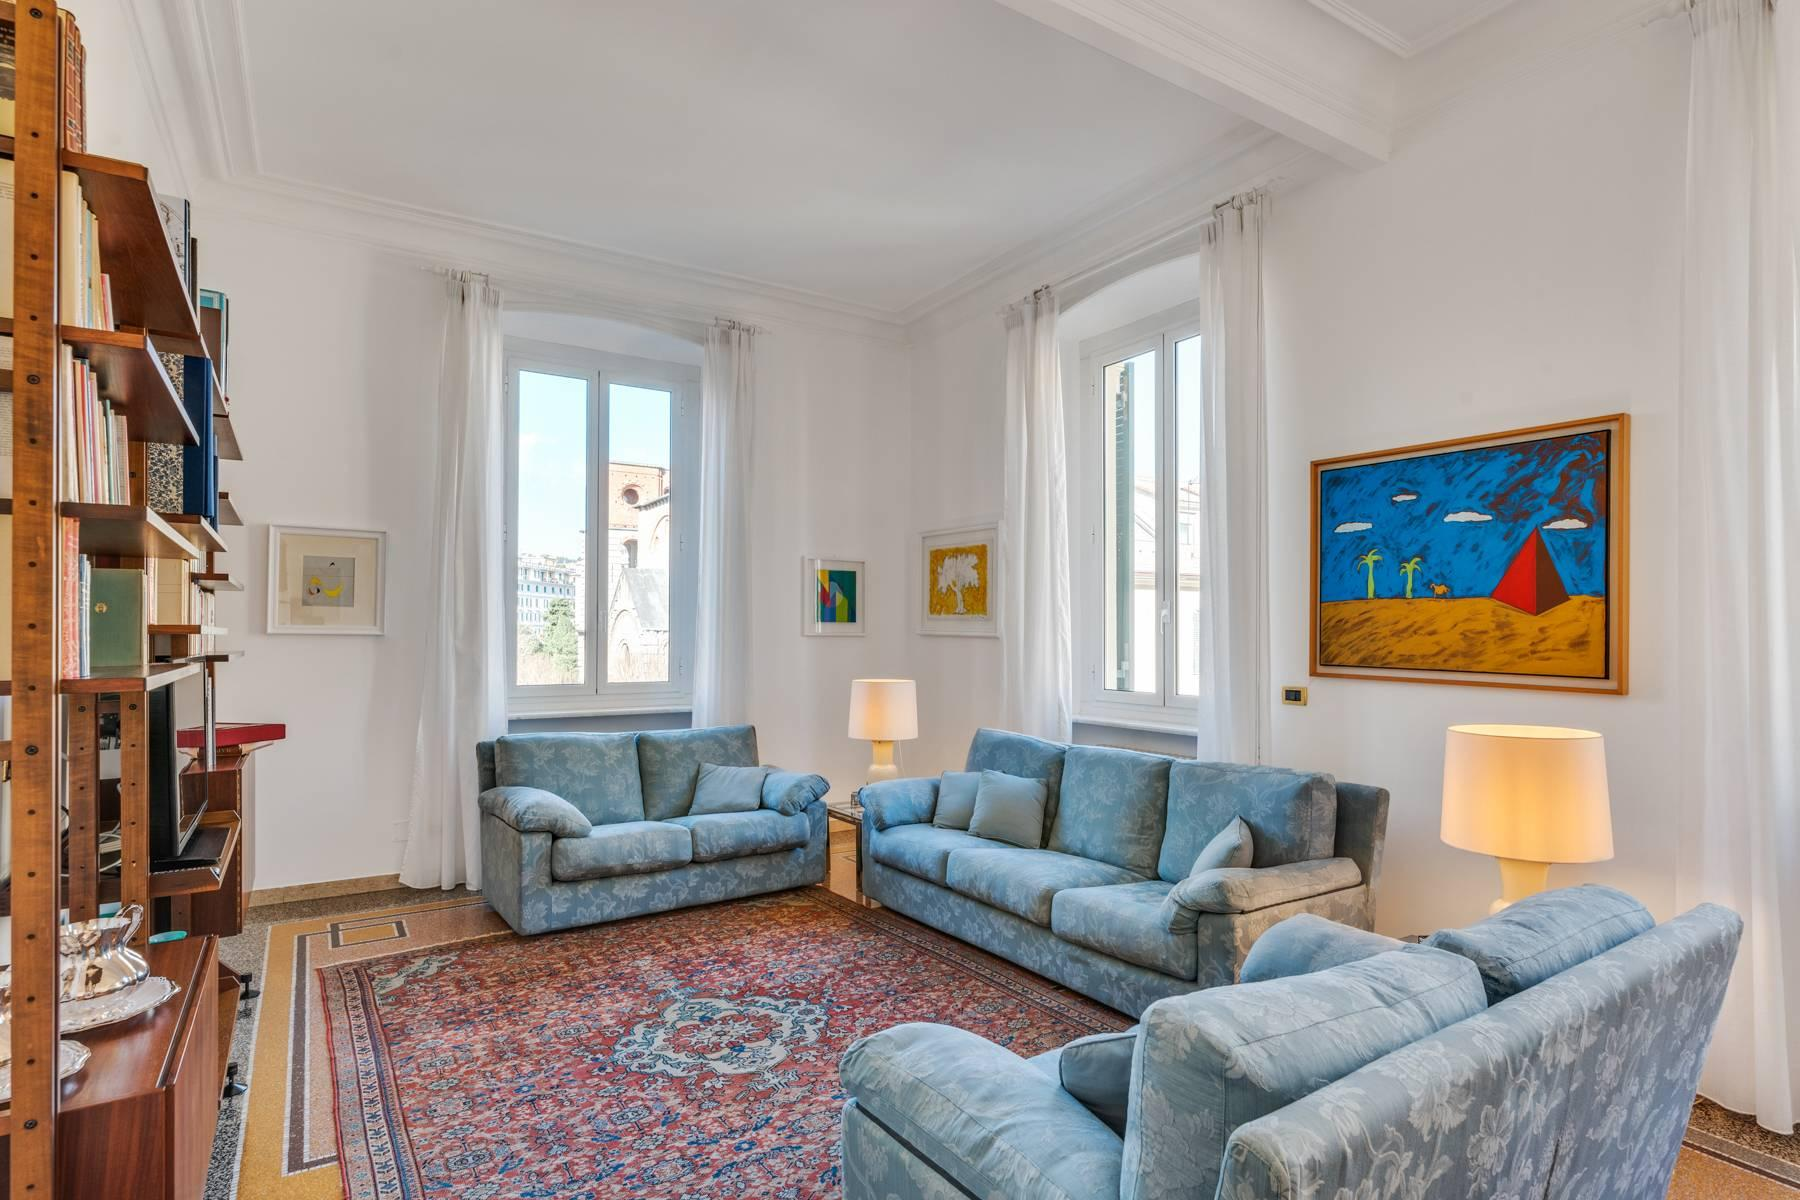 Prestigious 275 sqm apartment inside a period building in Carignano - 9